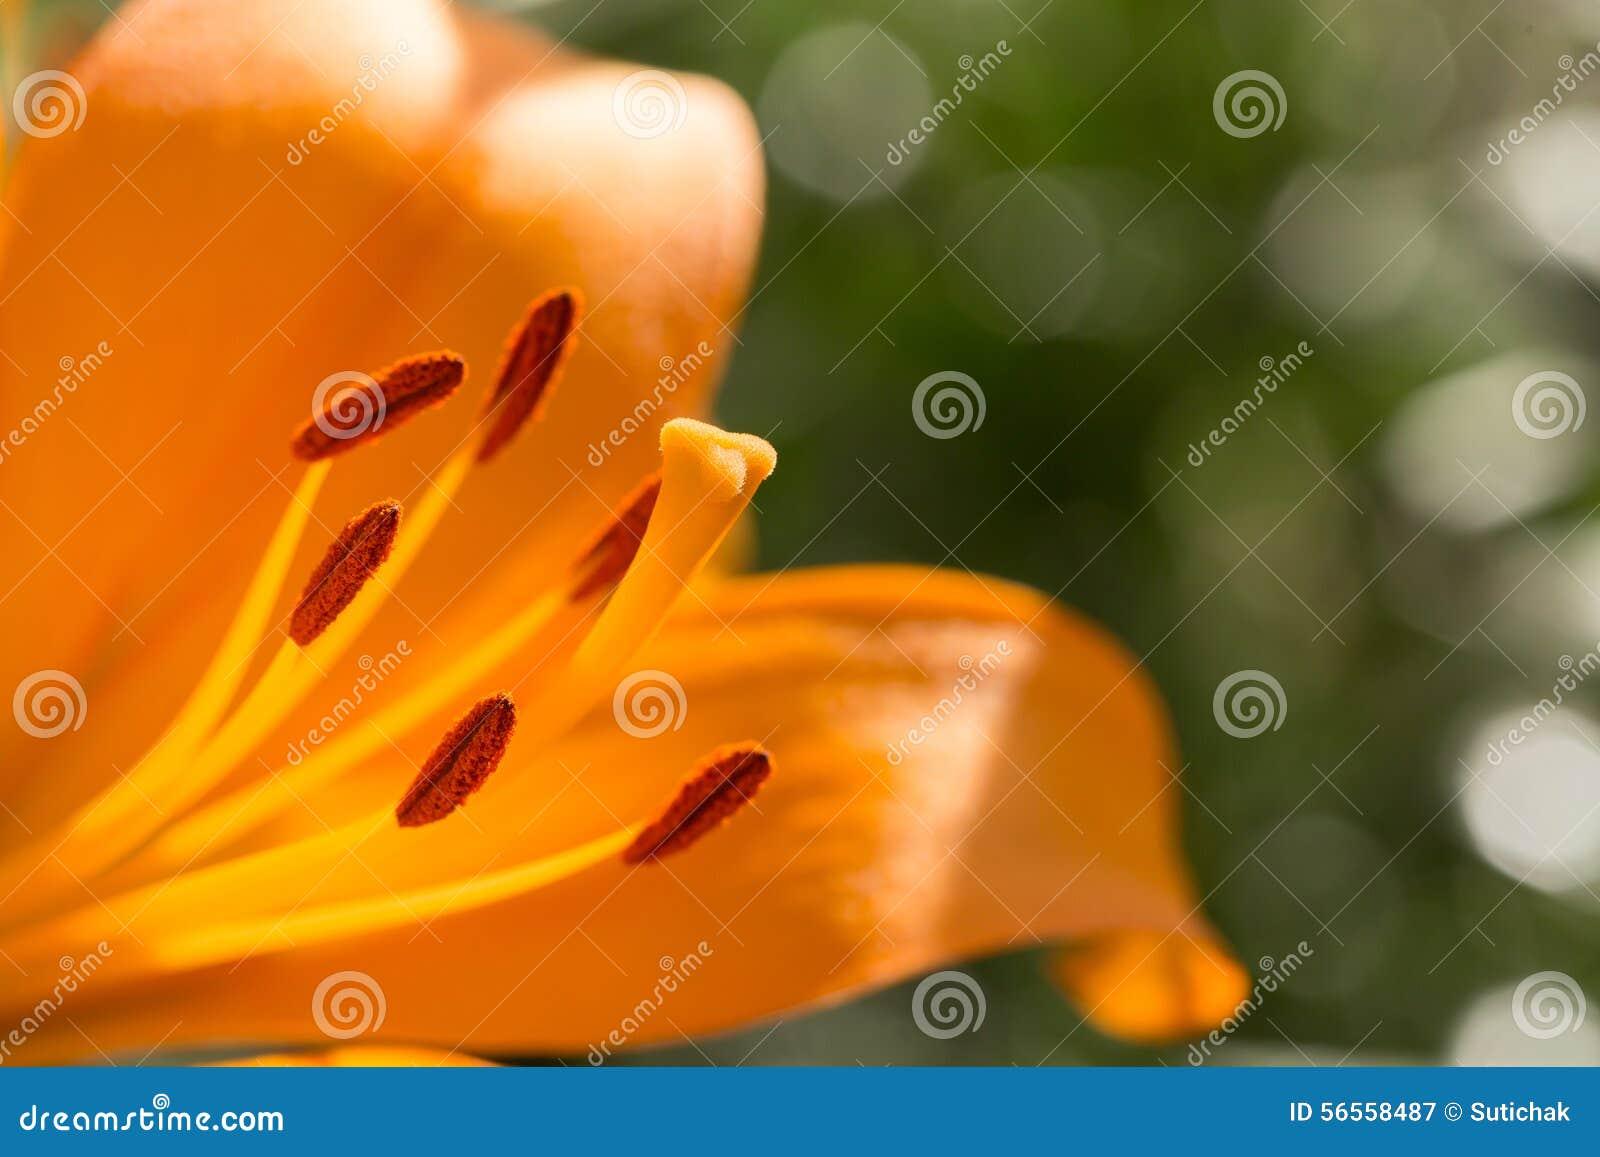 Download Όμορφη άνθιση λουλουδιών κρίνων Στοκ Εικόνα - εικόνα από ανθίζοντας, άνθος: 56558487